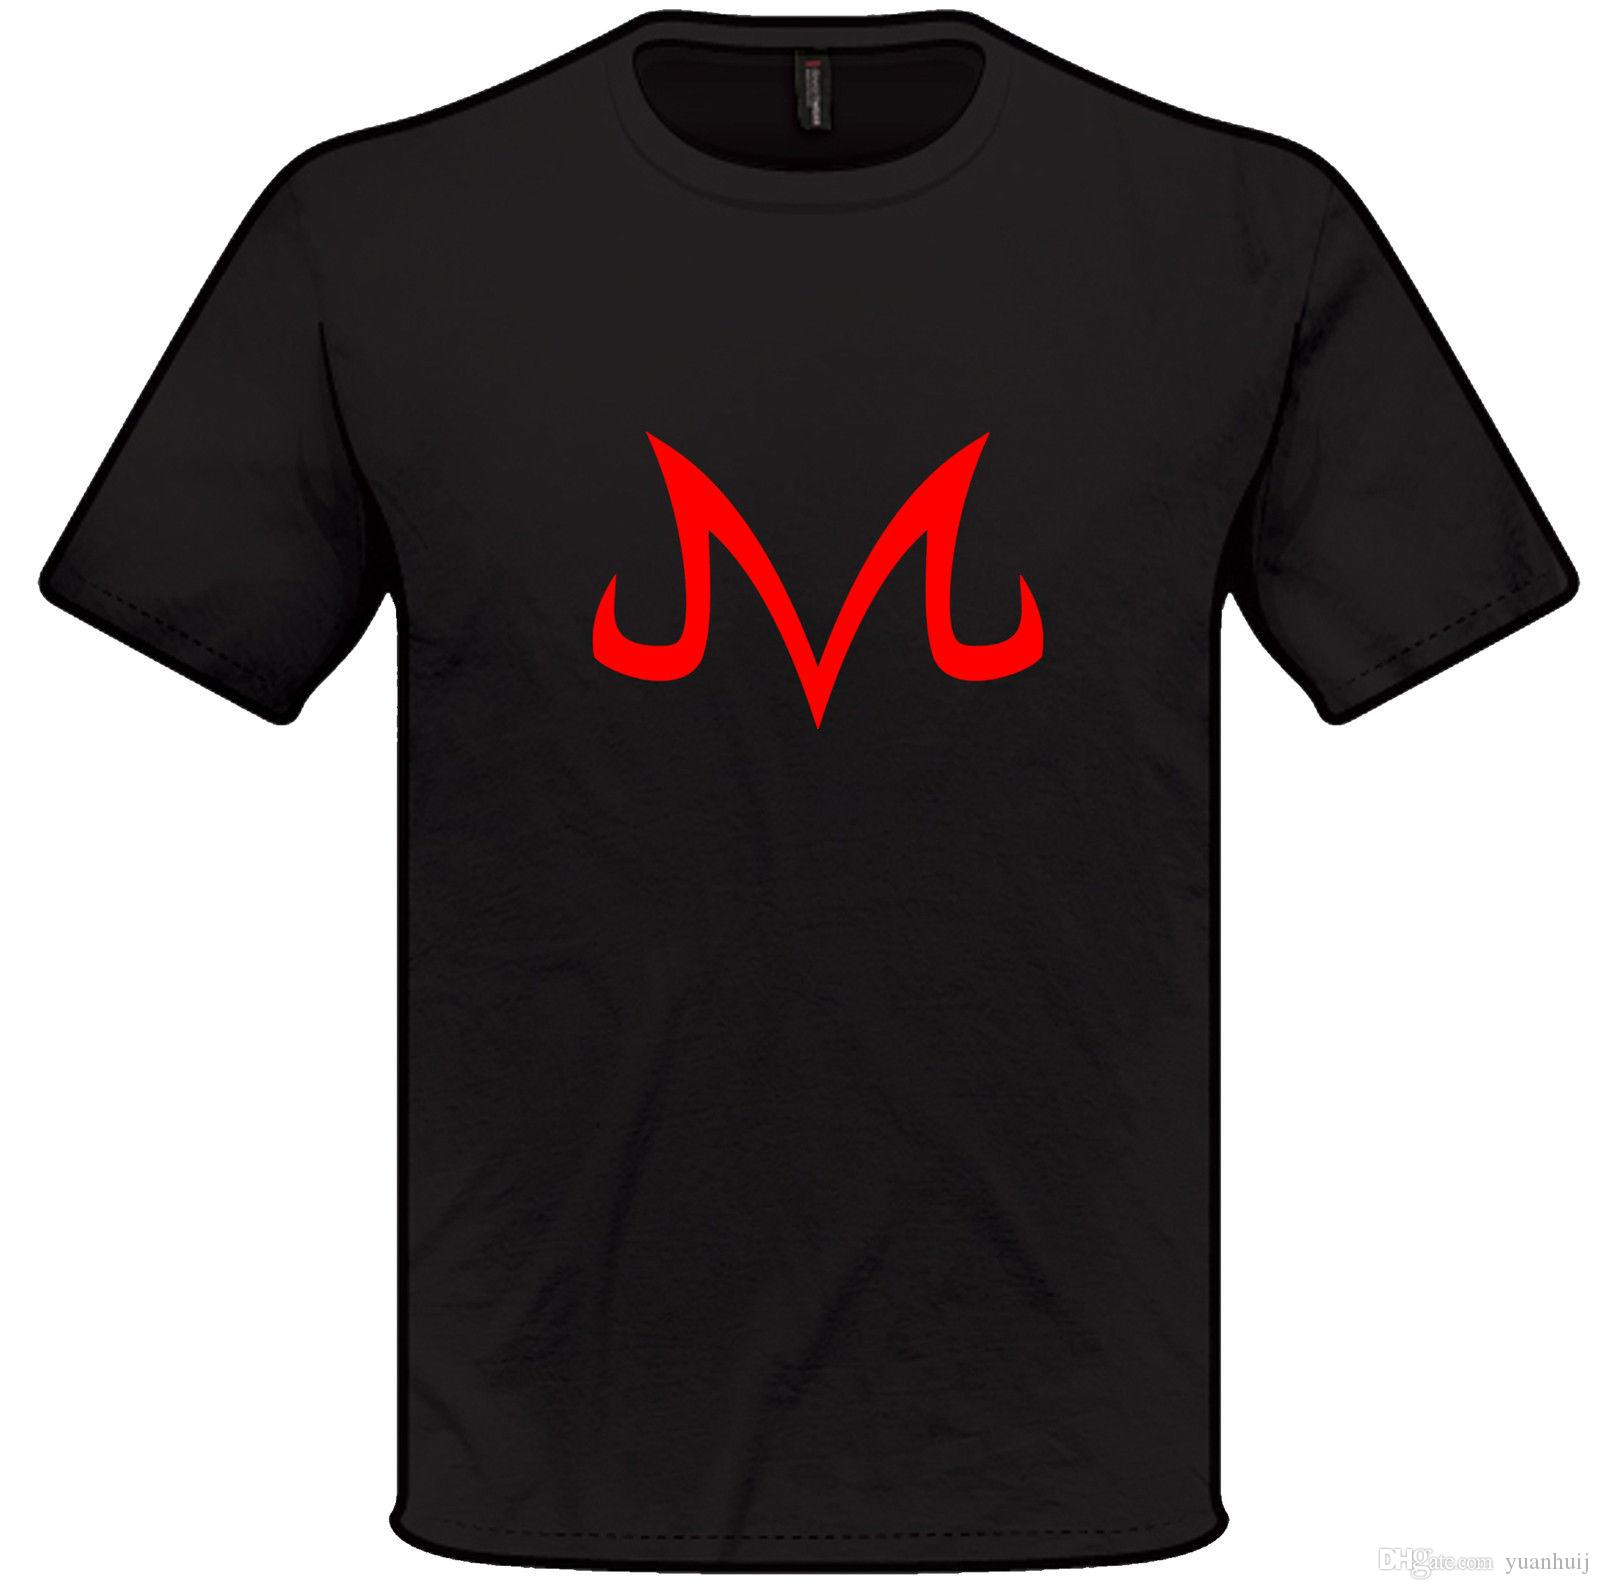 Majin Buu Symbol T Shirt Anime Dragotop Teell Z Mens Womens T Shart